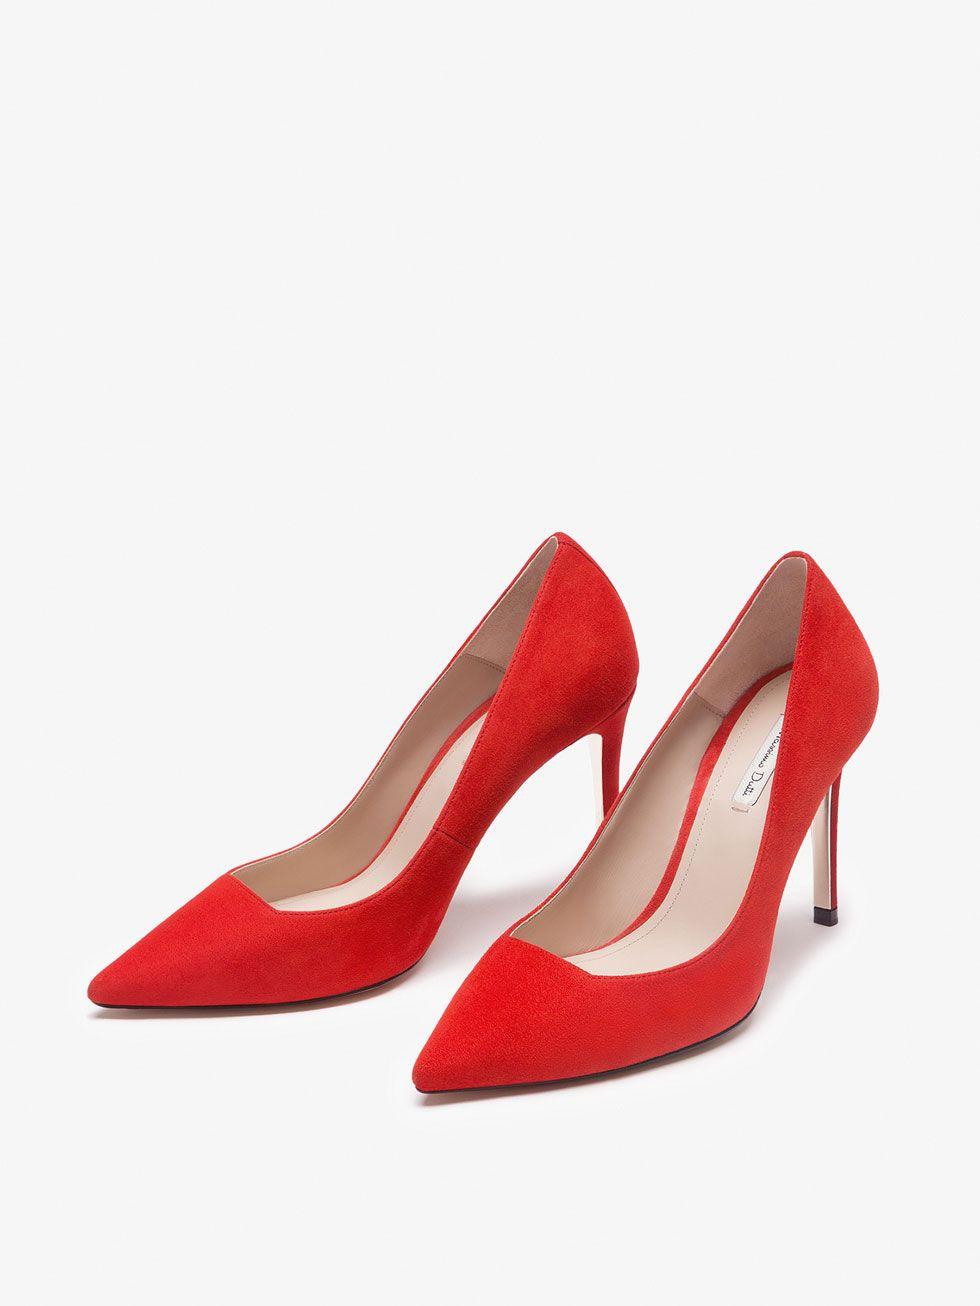 SALÓN METÁLICA PIEL ANTE de MUJER - Zapatos - Zapatos de Tacón de Massimo  Dutti de Primavera Verano 2017 por 1995. ¡Elegancia natural! d97286edfba2